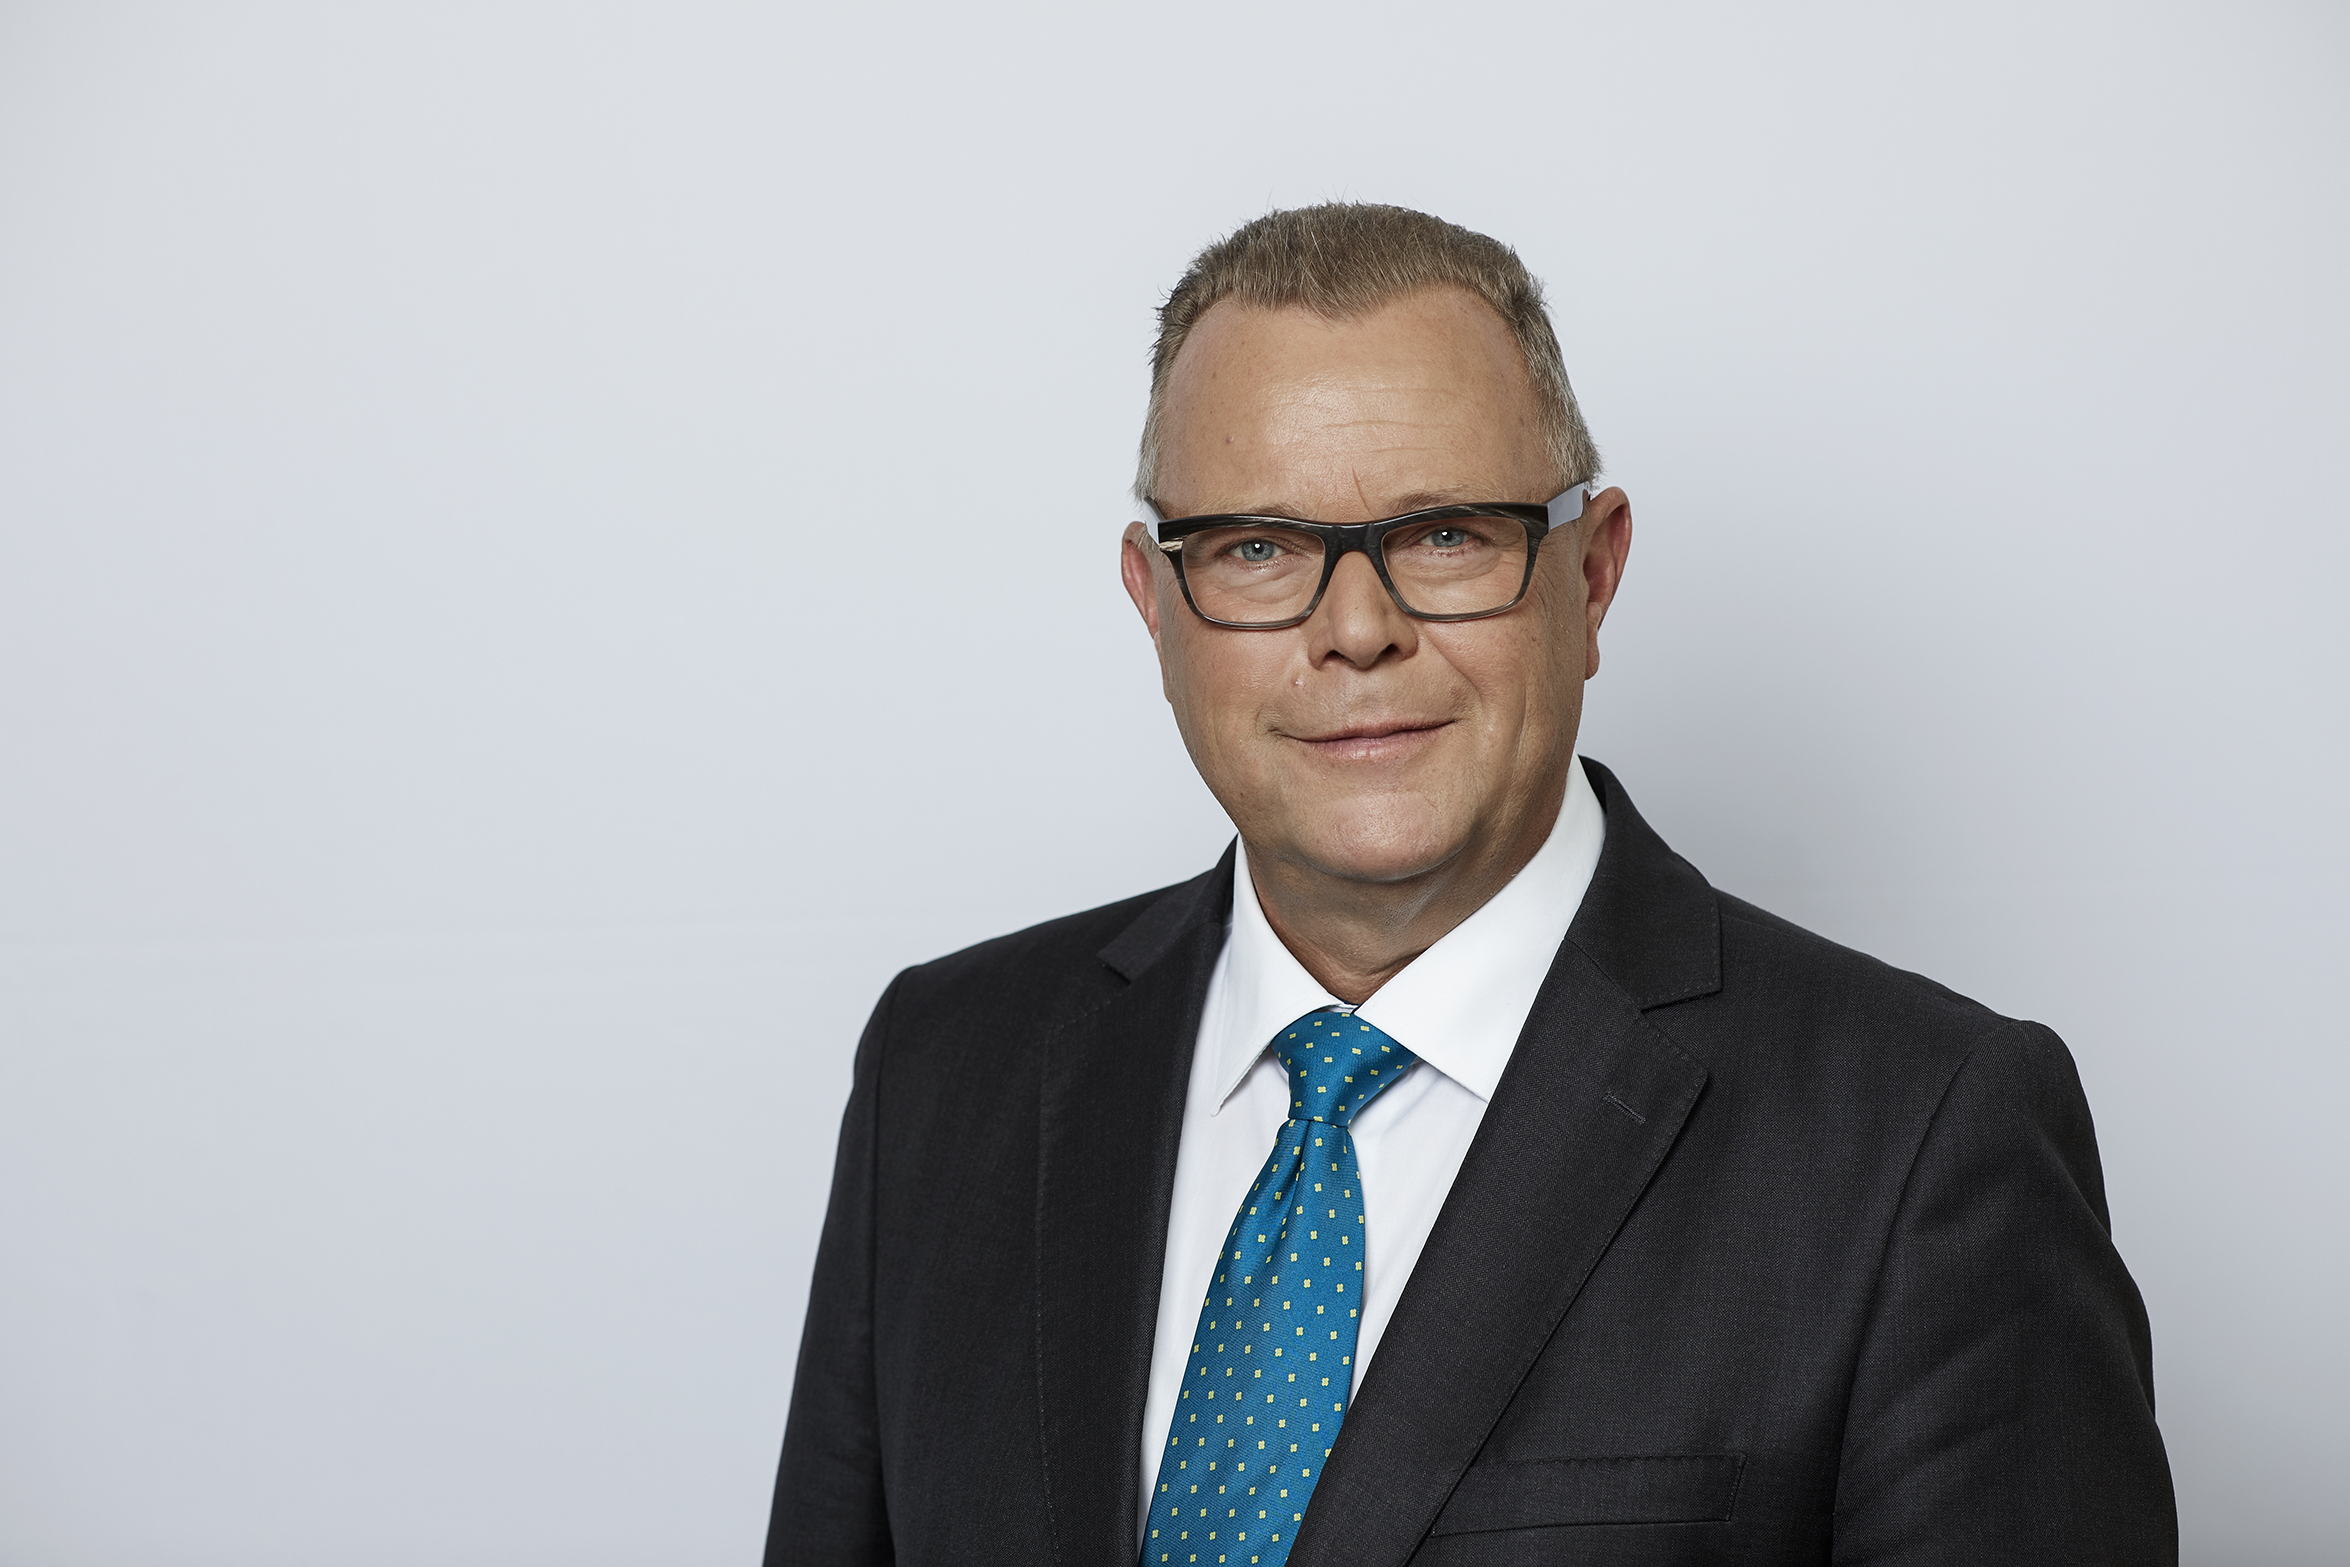 Michael Stübgen